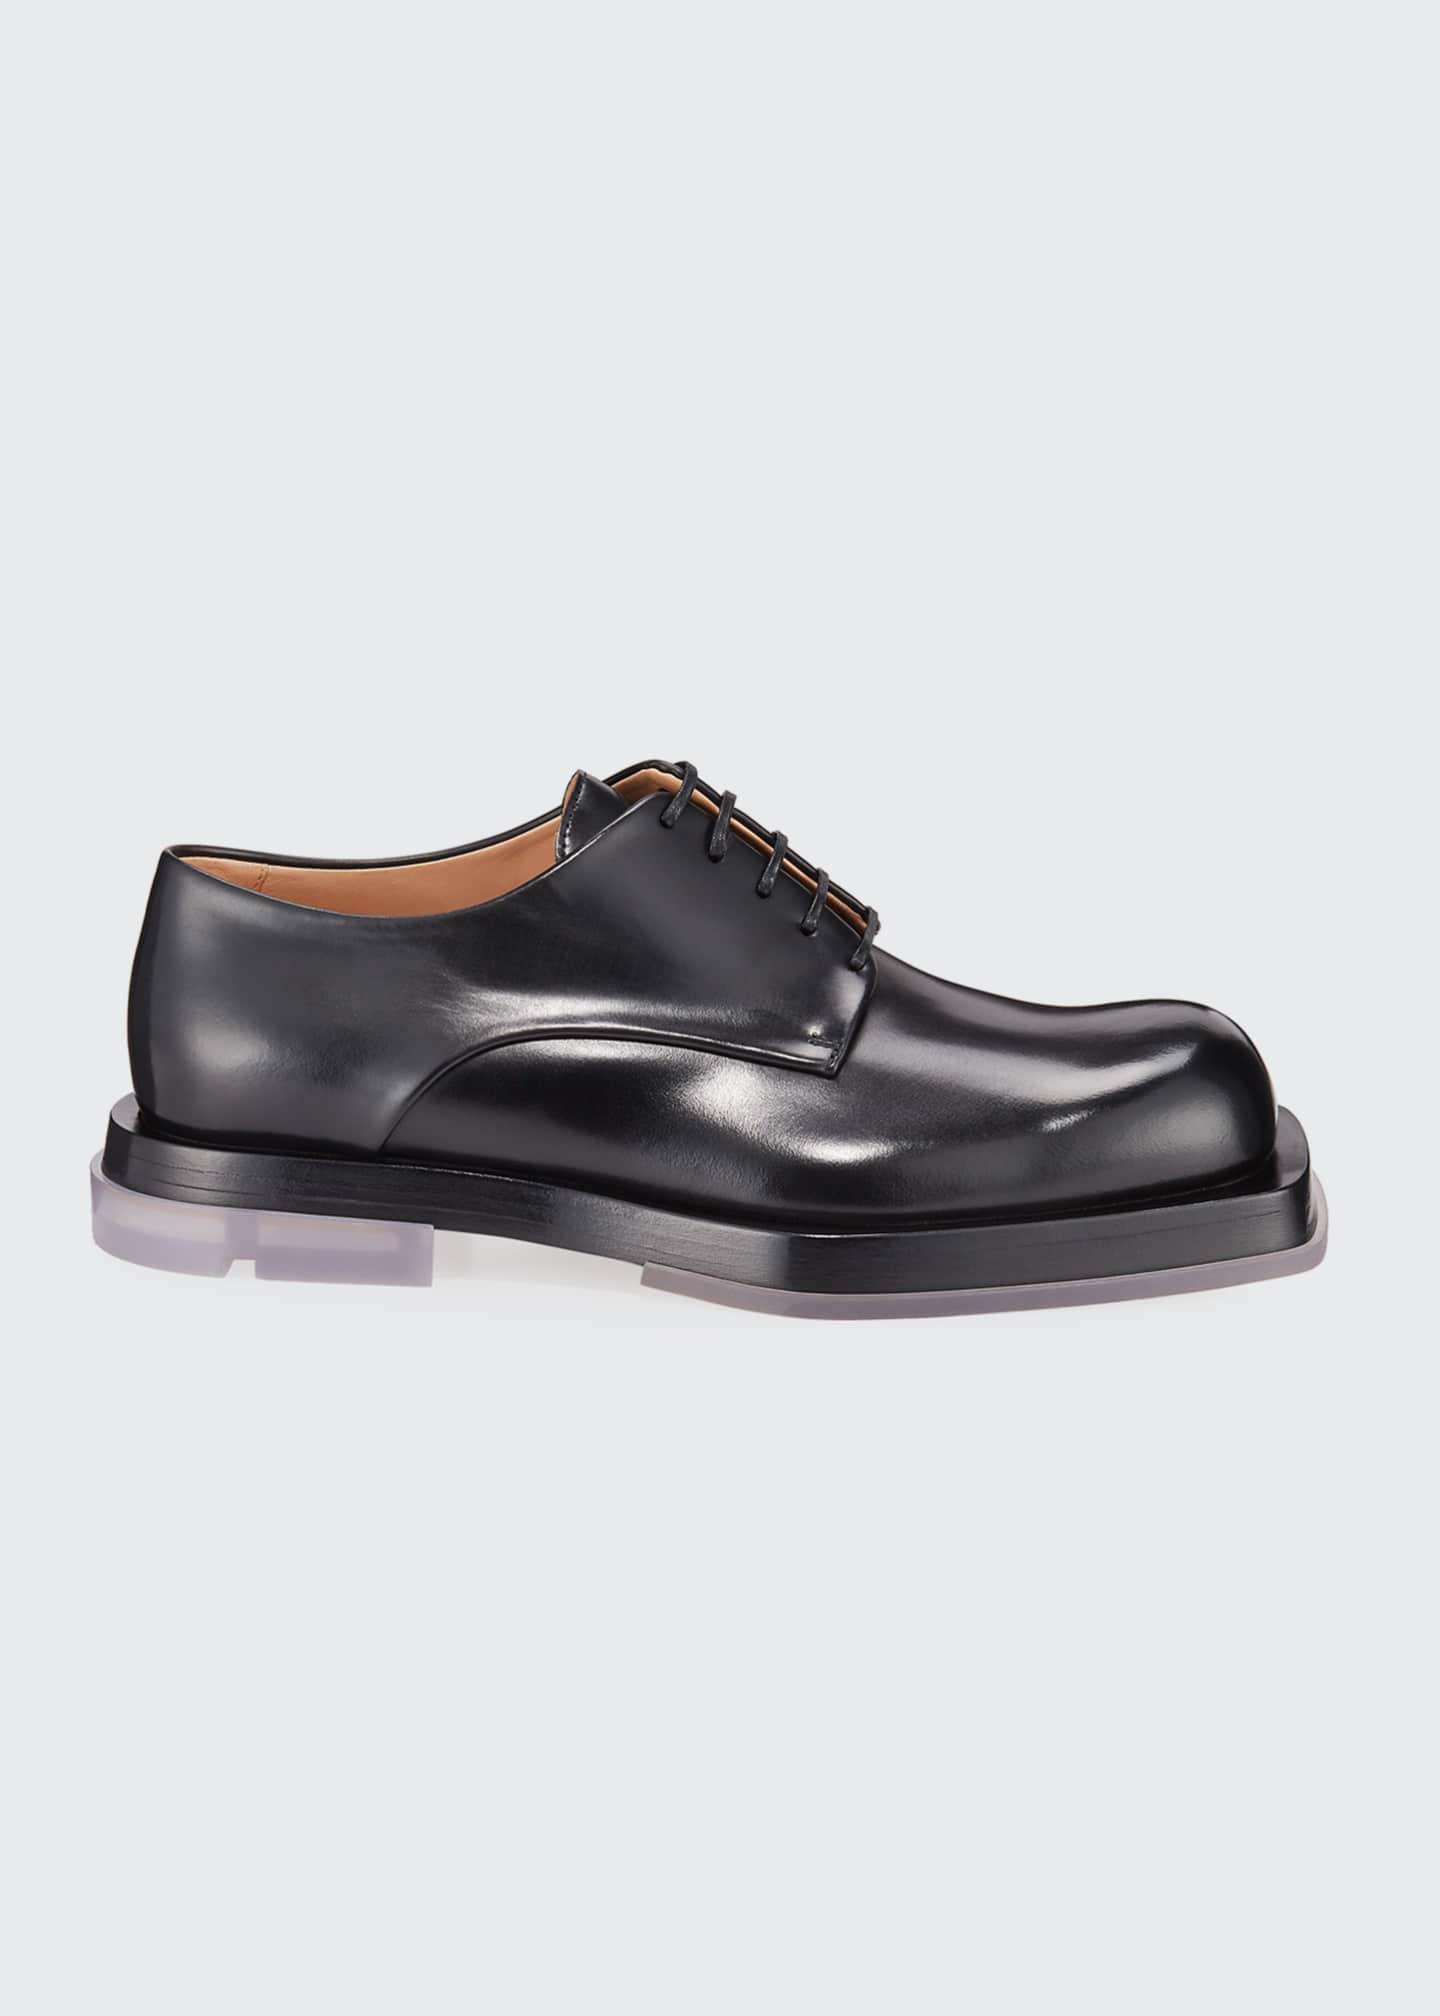 Bottega Veneta Men's Lennon Platform Leather Derby Shoes